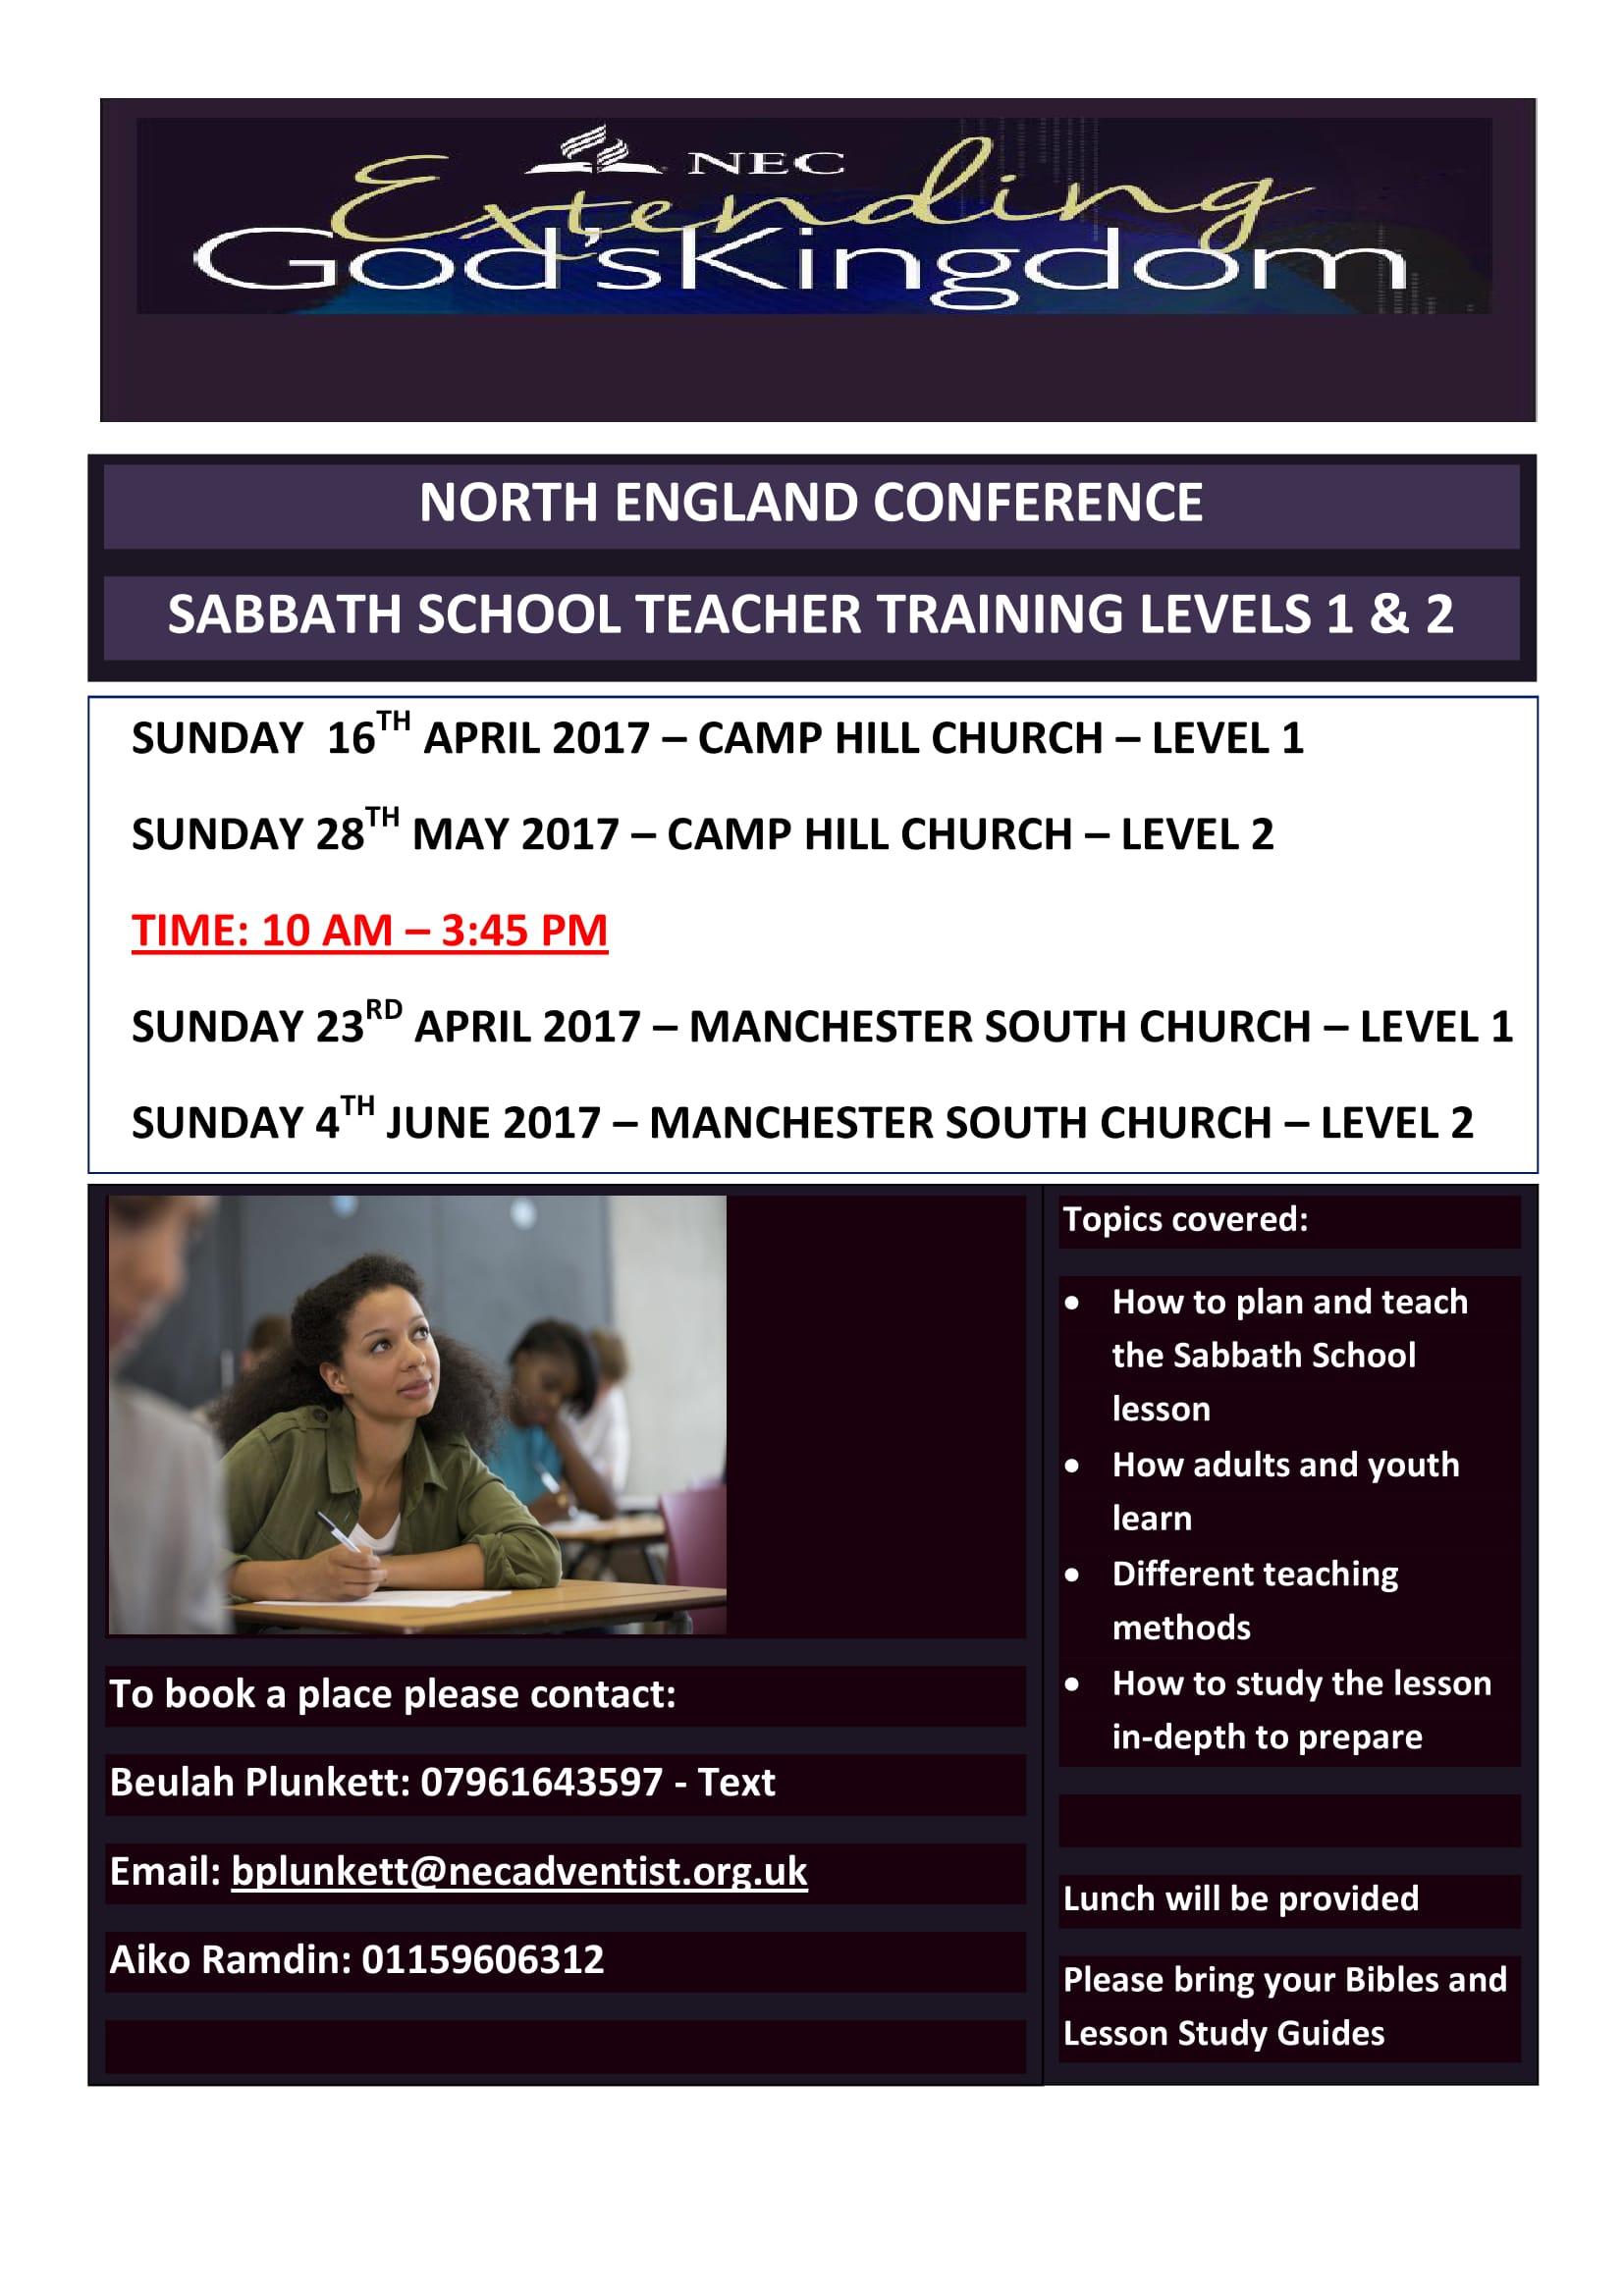 Sabbath School Teacher Training 2017 Poster